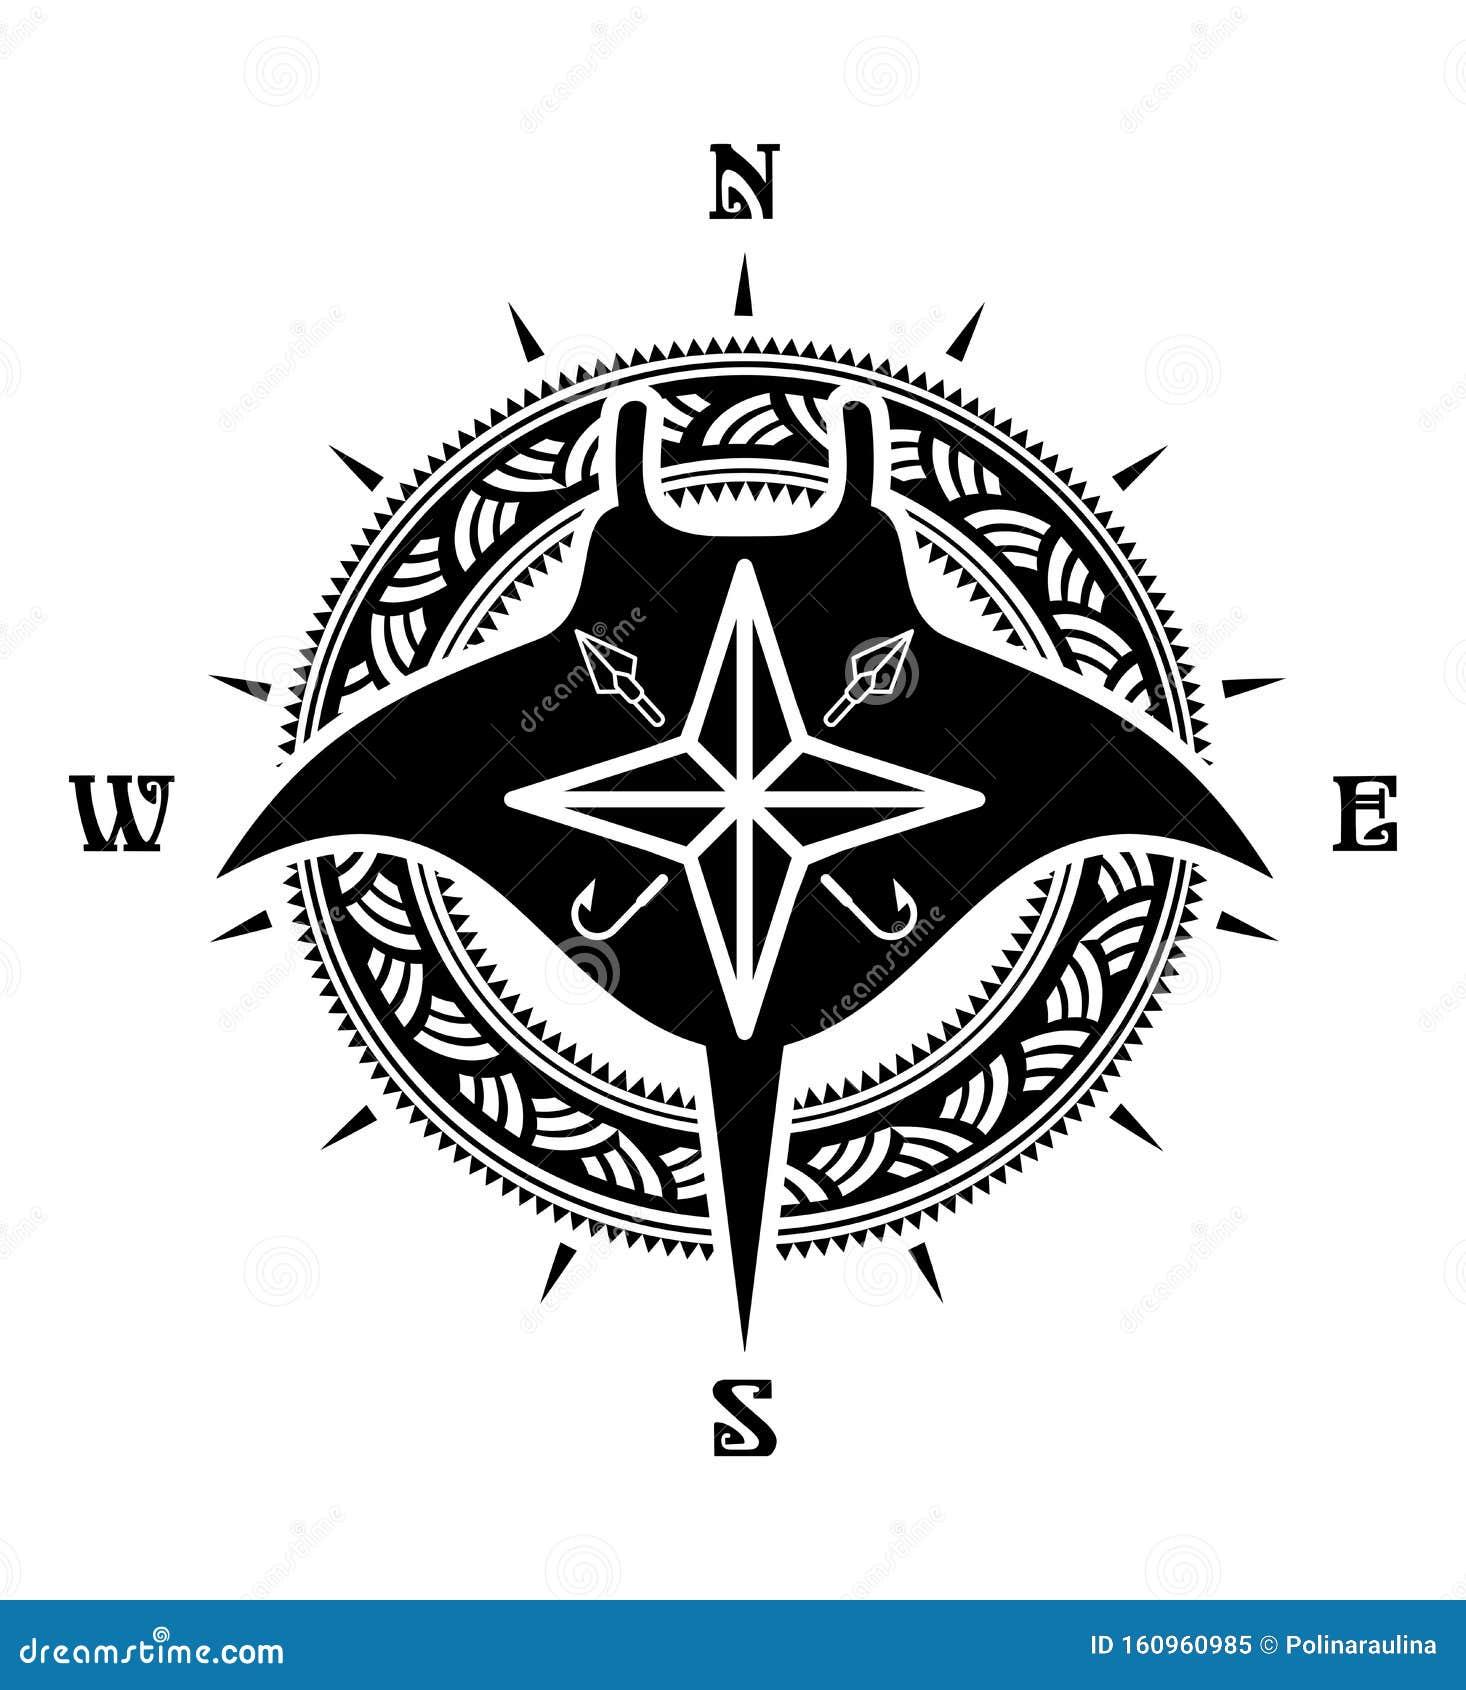 Maori Style Manta Ray Silhouette Tattoo Drawing Stock Image